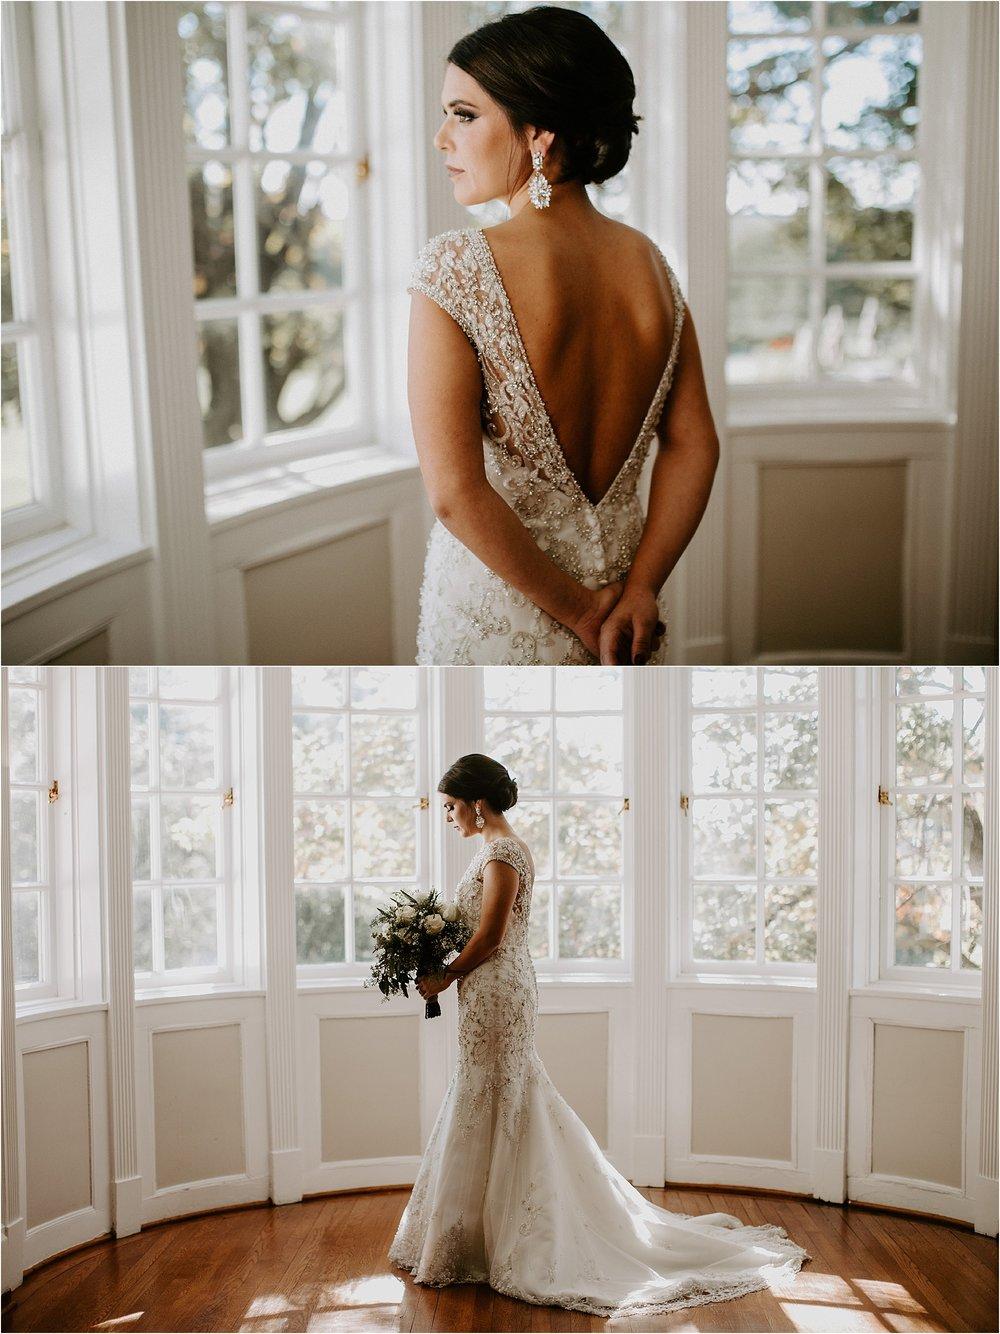 Sarah_Brookhart_Philadelphia_Wedding_Photographer_0015.jpg